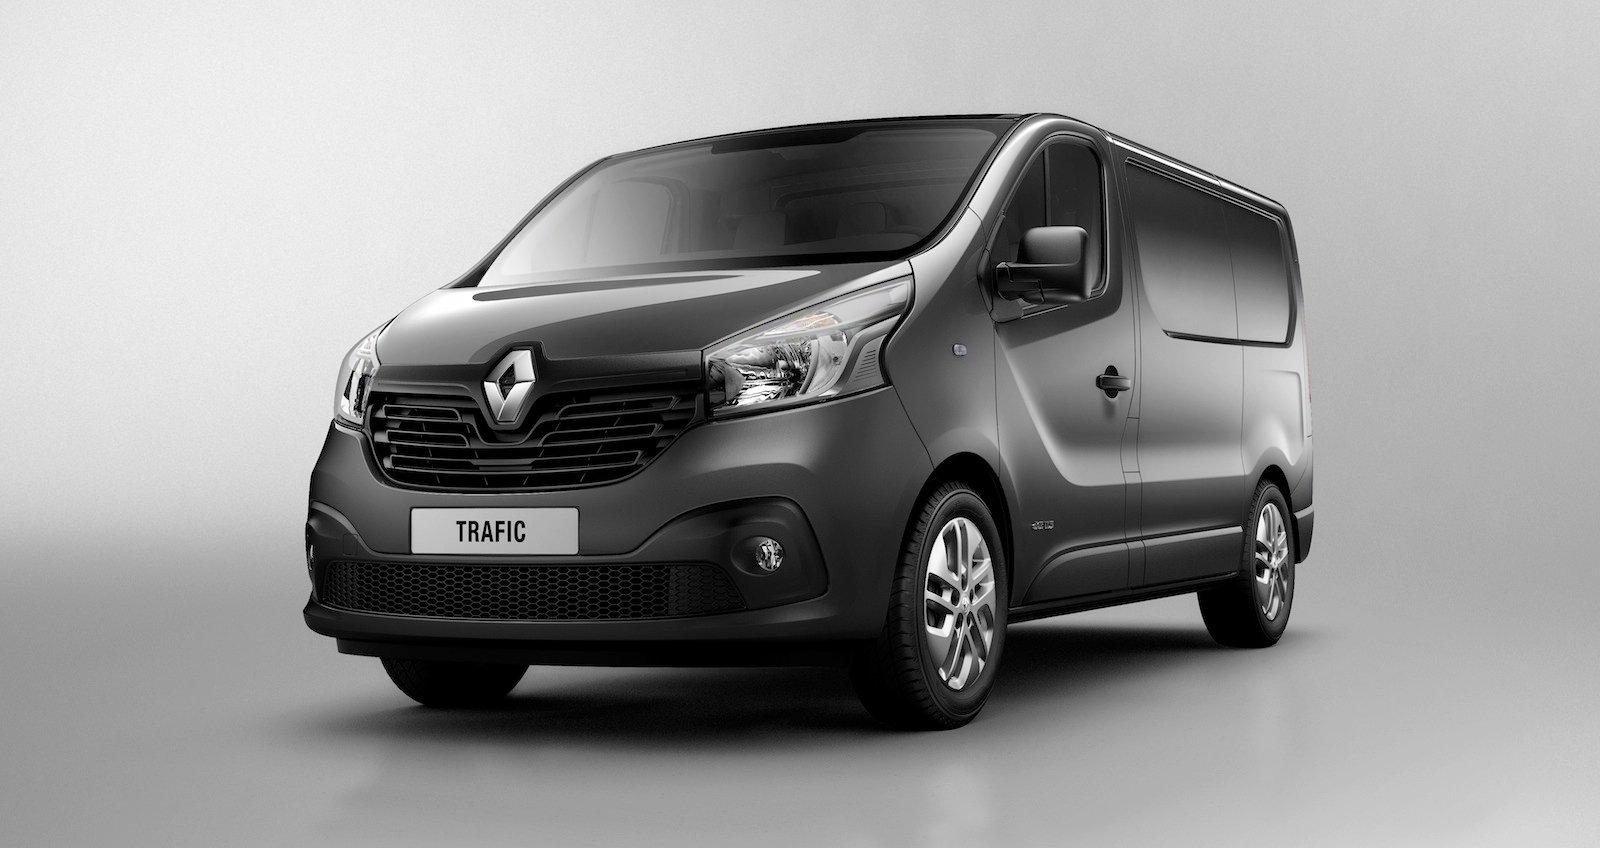 Renault Trafic van revealed - Photos (1 of 5)  Renault Trafic ...